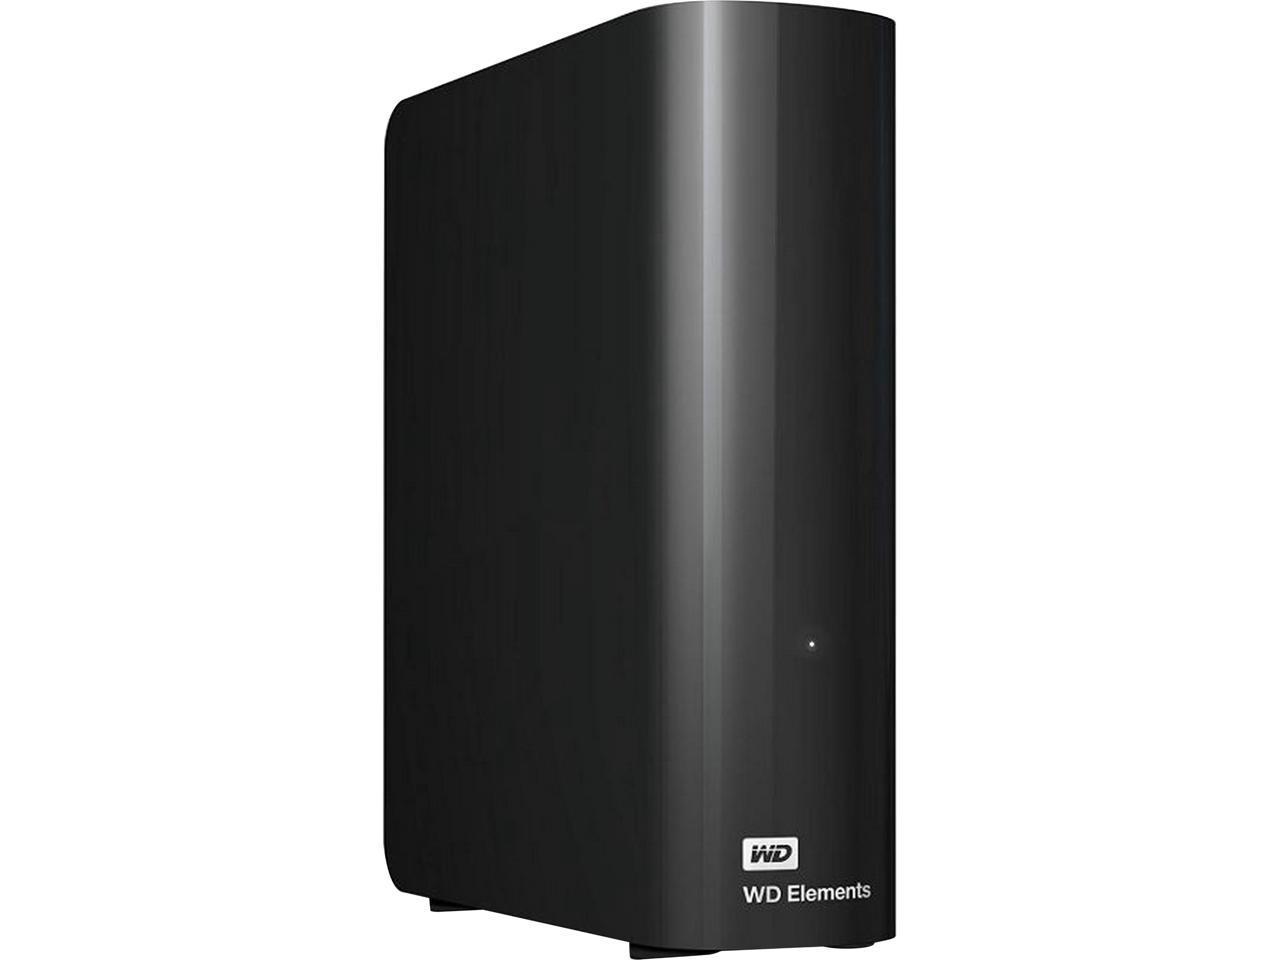 Newegg: WD Elements 14TB USB 3.0, Micro-B Desktop Hard Drive @ 9.99 + Free Shipping